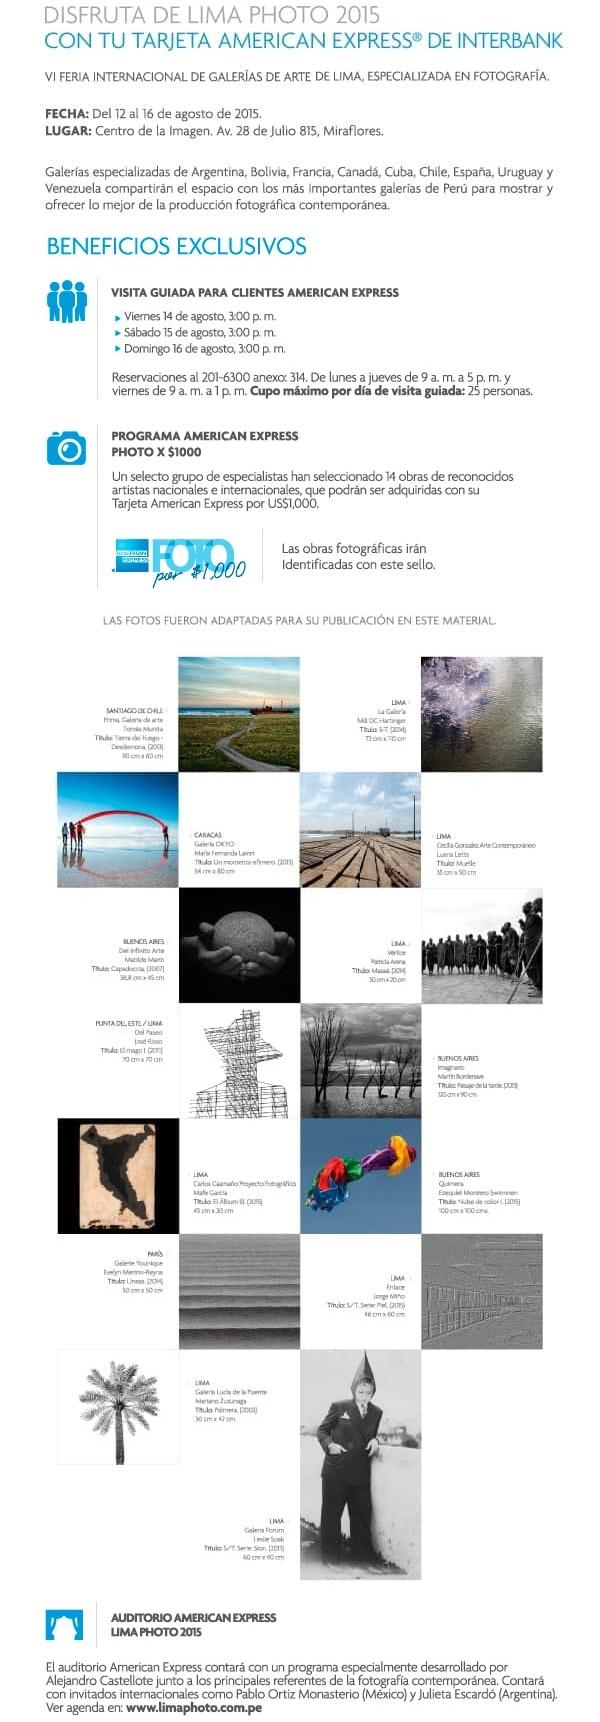 american express lima photo 2015